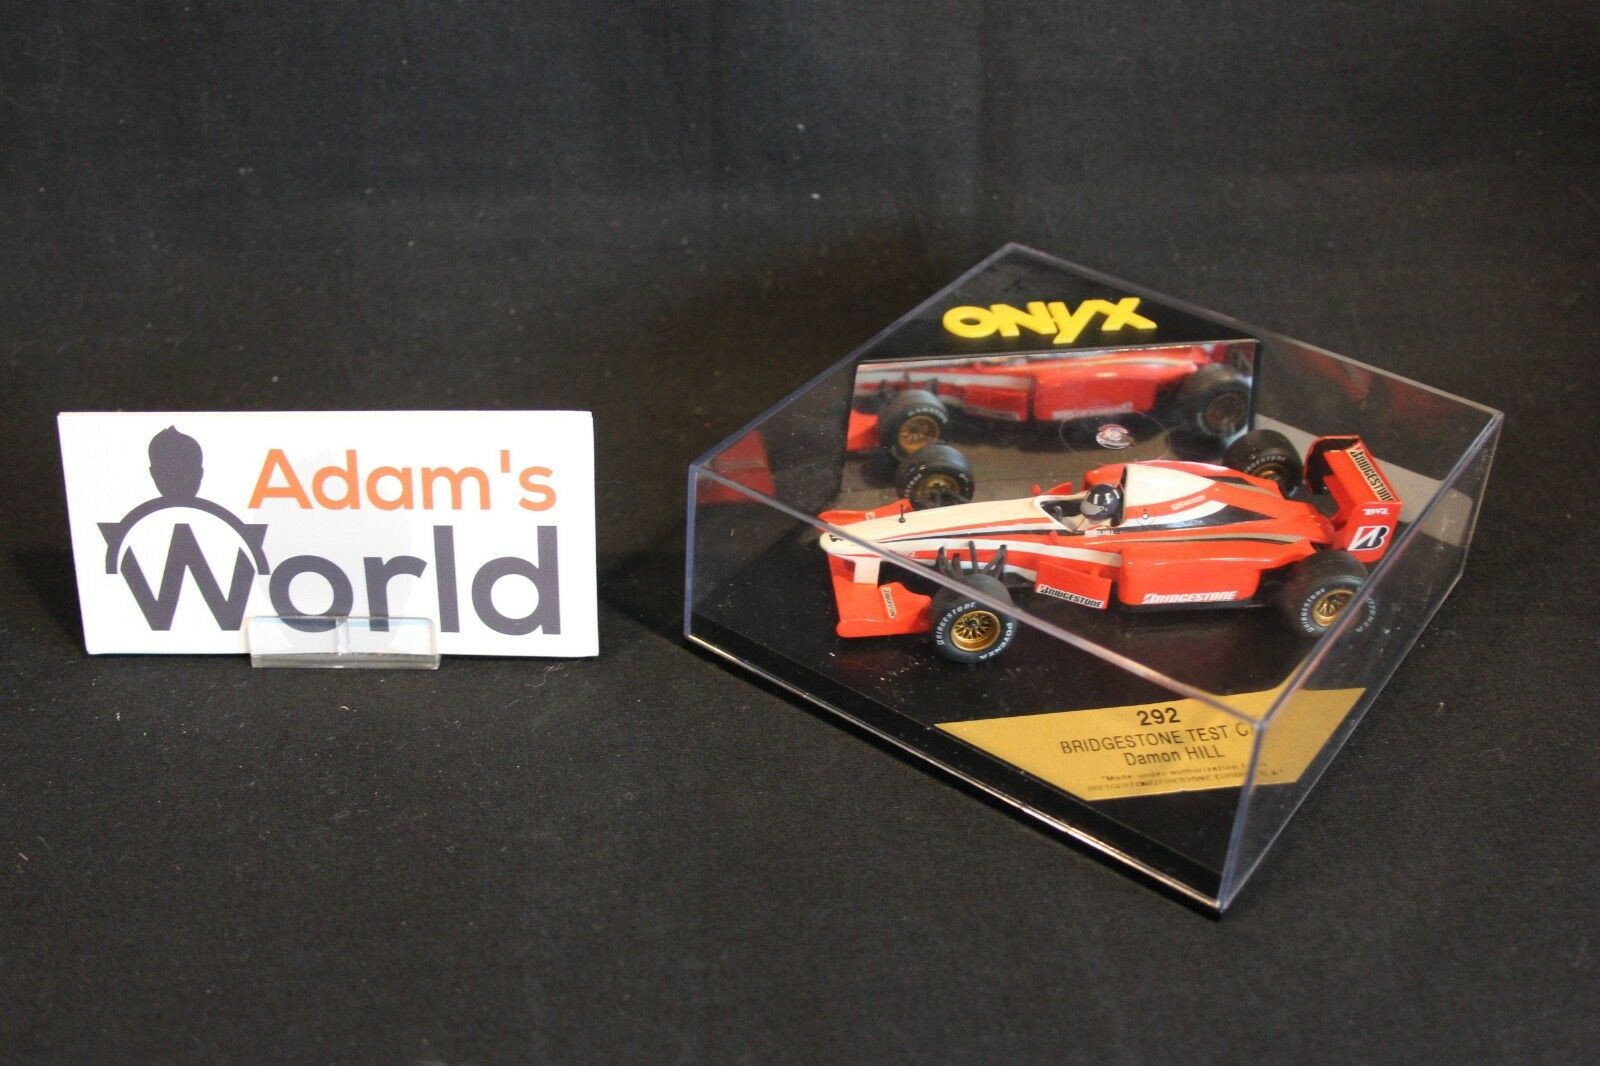 Onyx Bridgestone Test Car 1996 1 43 43 43 Damon Hill (GBR) (MM1) c170b1